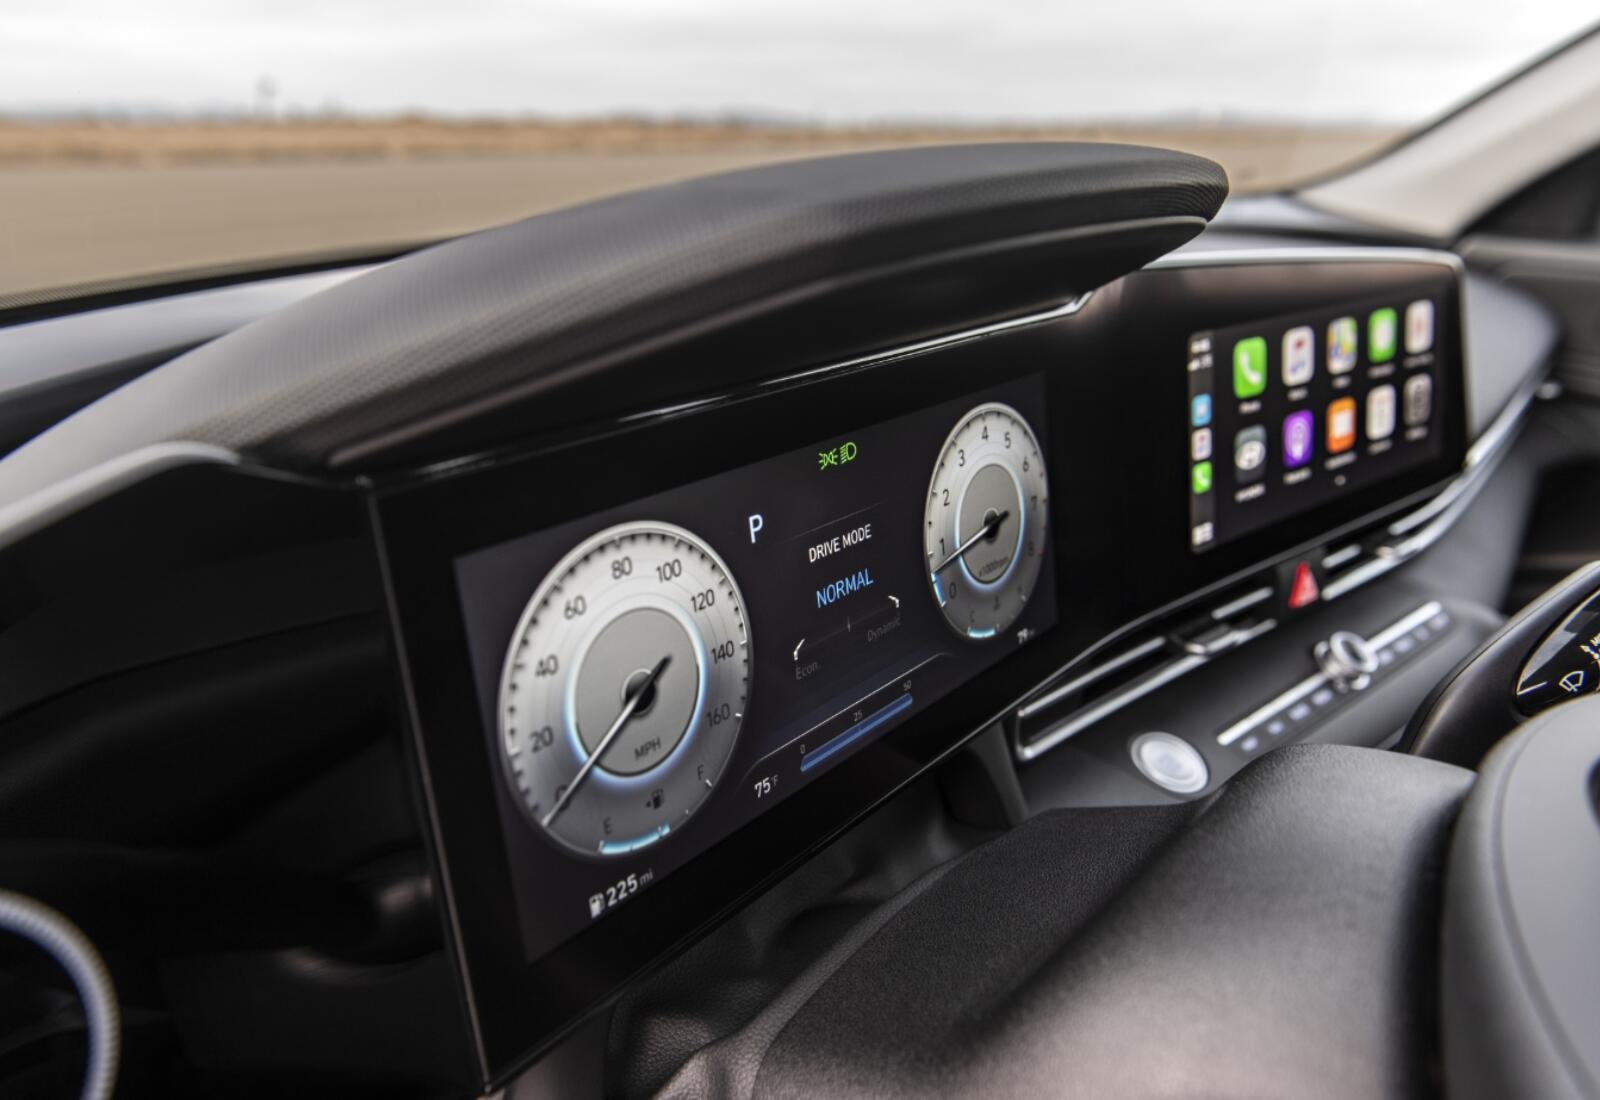 Hyundai Elentra Display